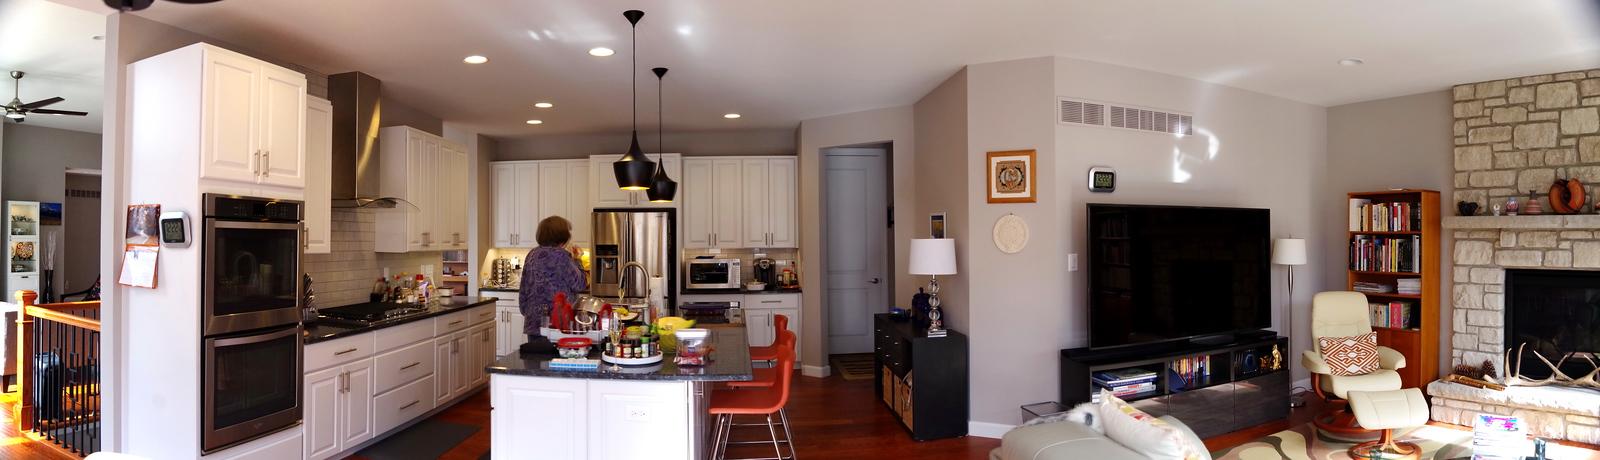 Kitchen-Great Room